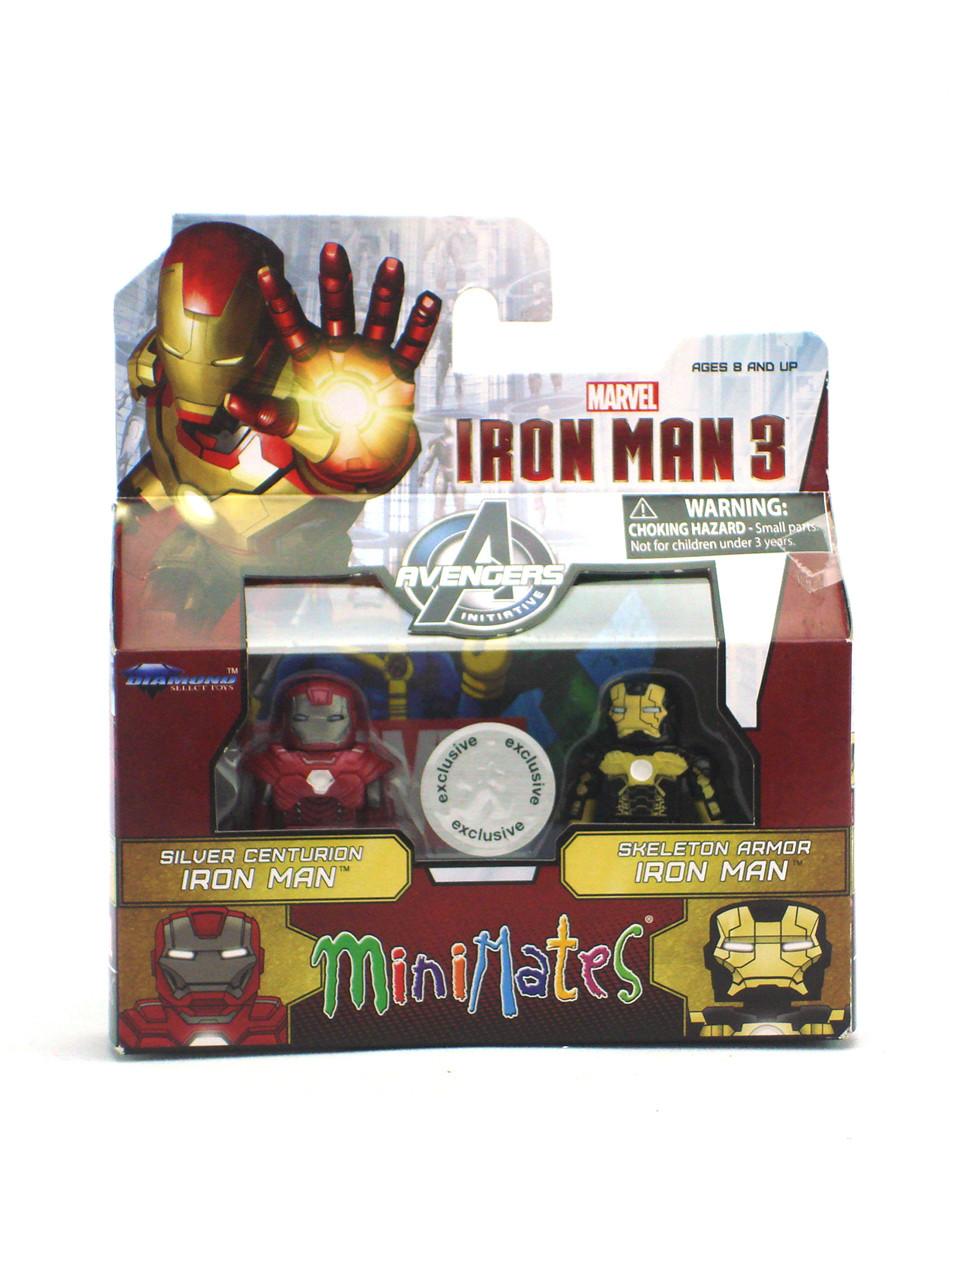 Marvel Minimates TRU Toys R Us Wave 19 Space Armor Iron Man /& Ronan the Accuser